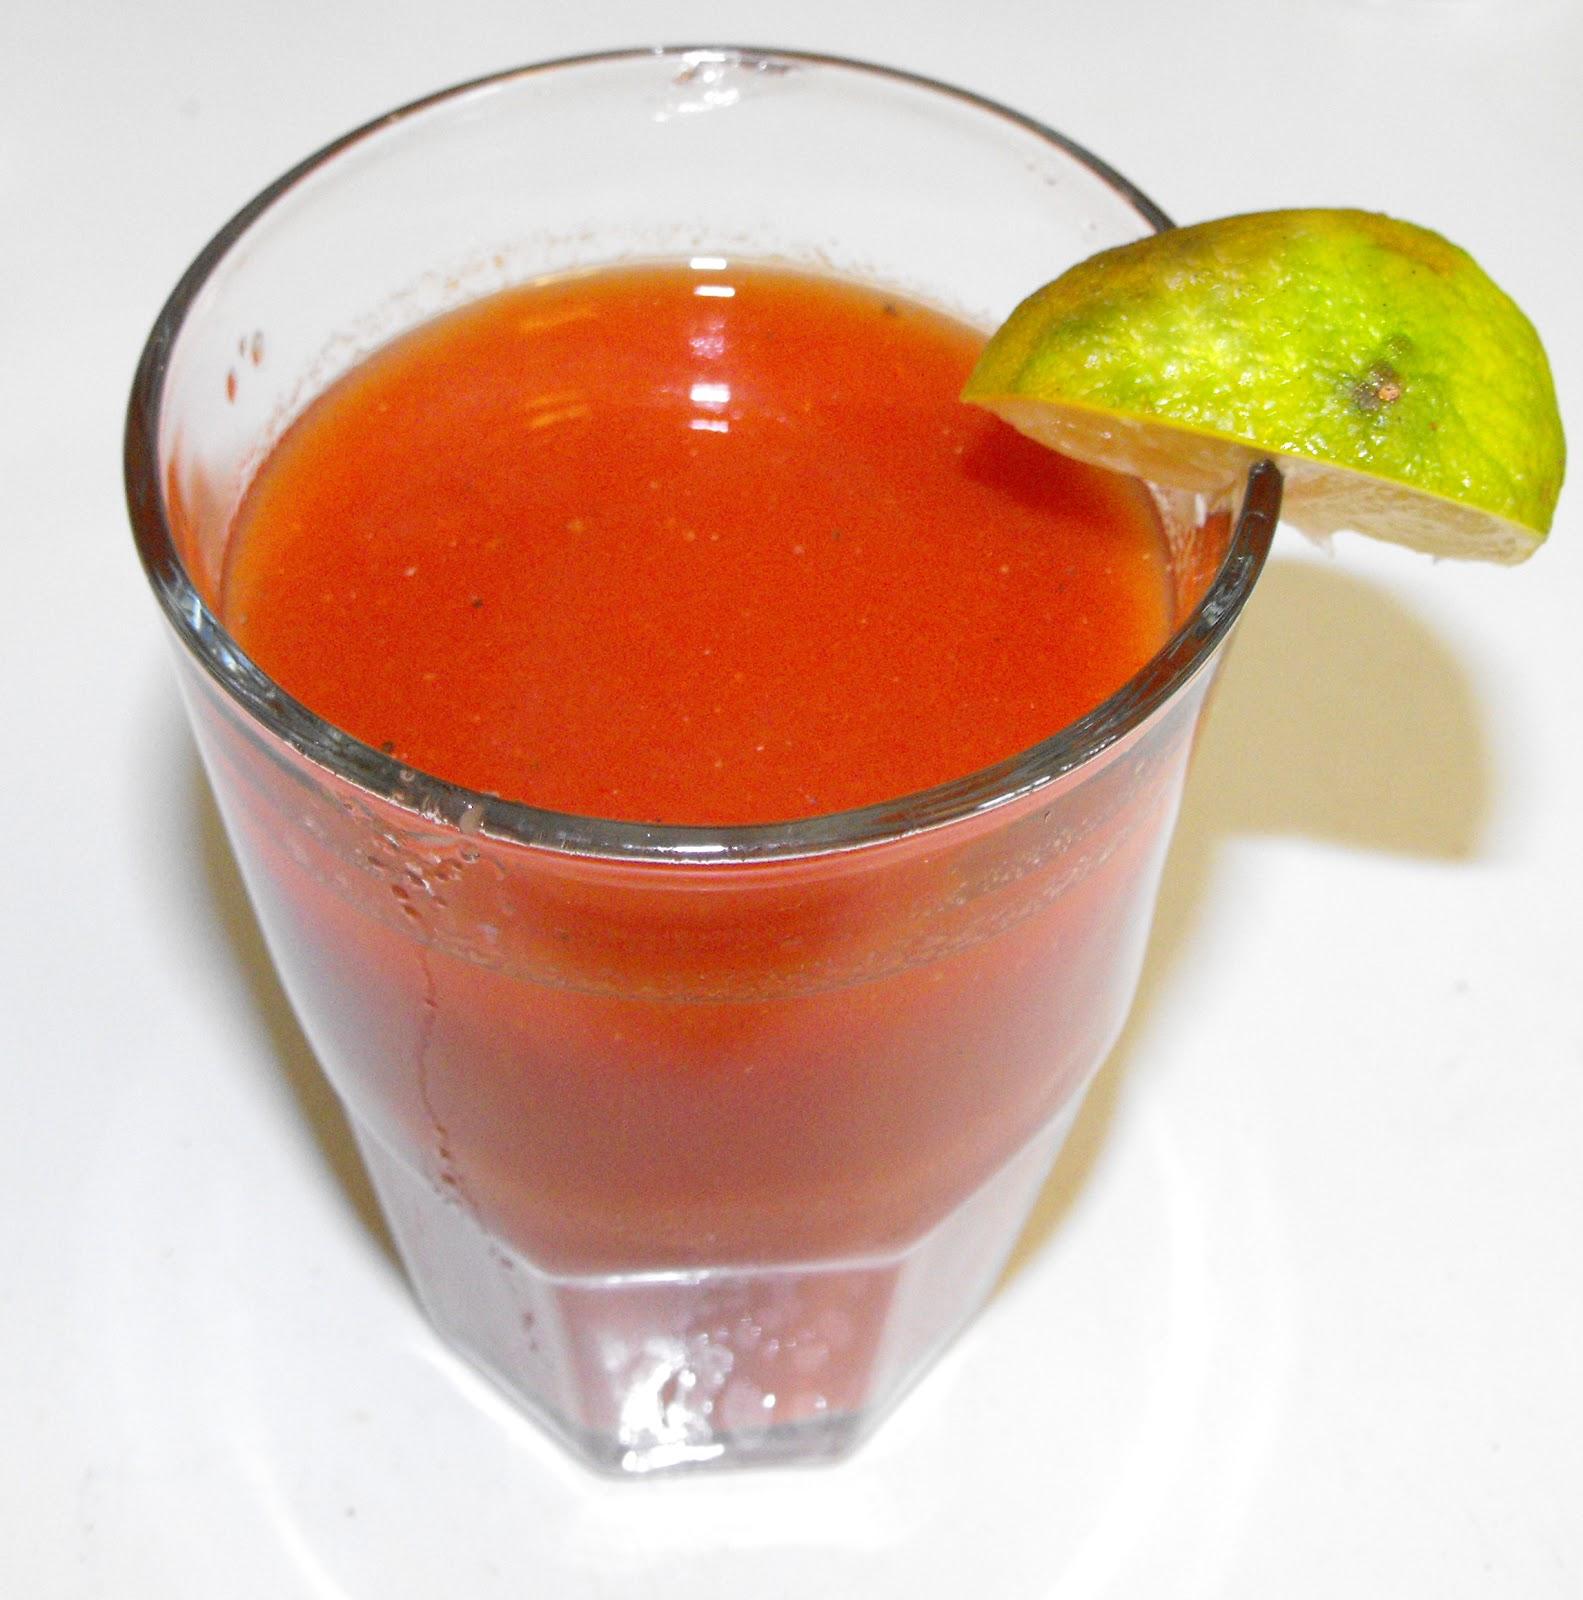 http://2.bp.blogspot.com/-fQWMspuUAfY/UMo6eJj9sUI/AAAAAAAAQic/ML7PPbbeAeY/s1600/cooking+beer+049.JPG